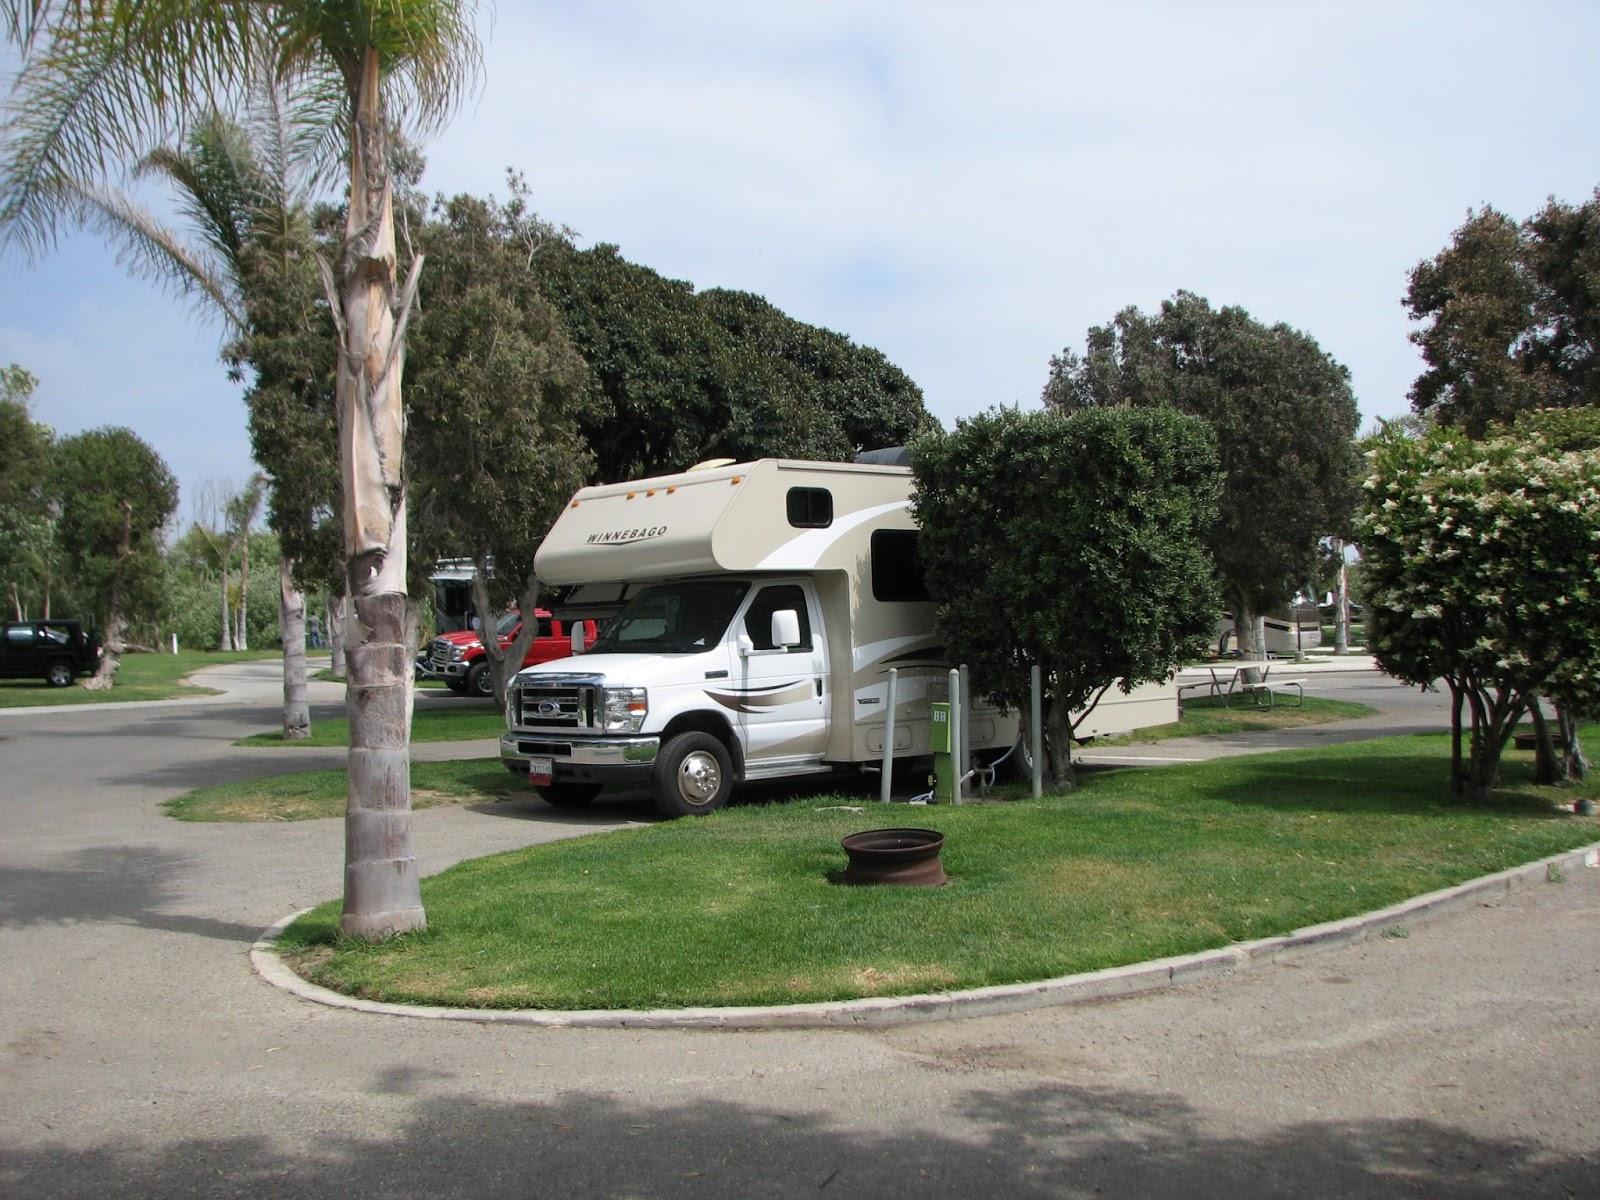 Armand S Rancho Del Cielo Ventura Beach Rv Resort Posted